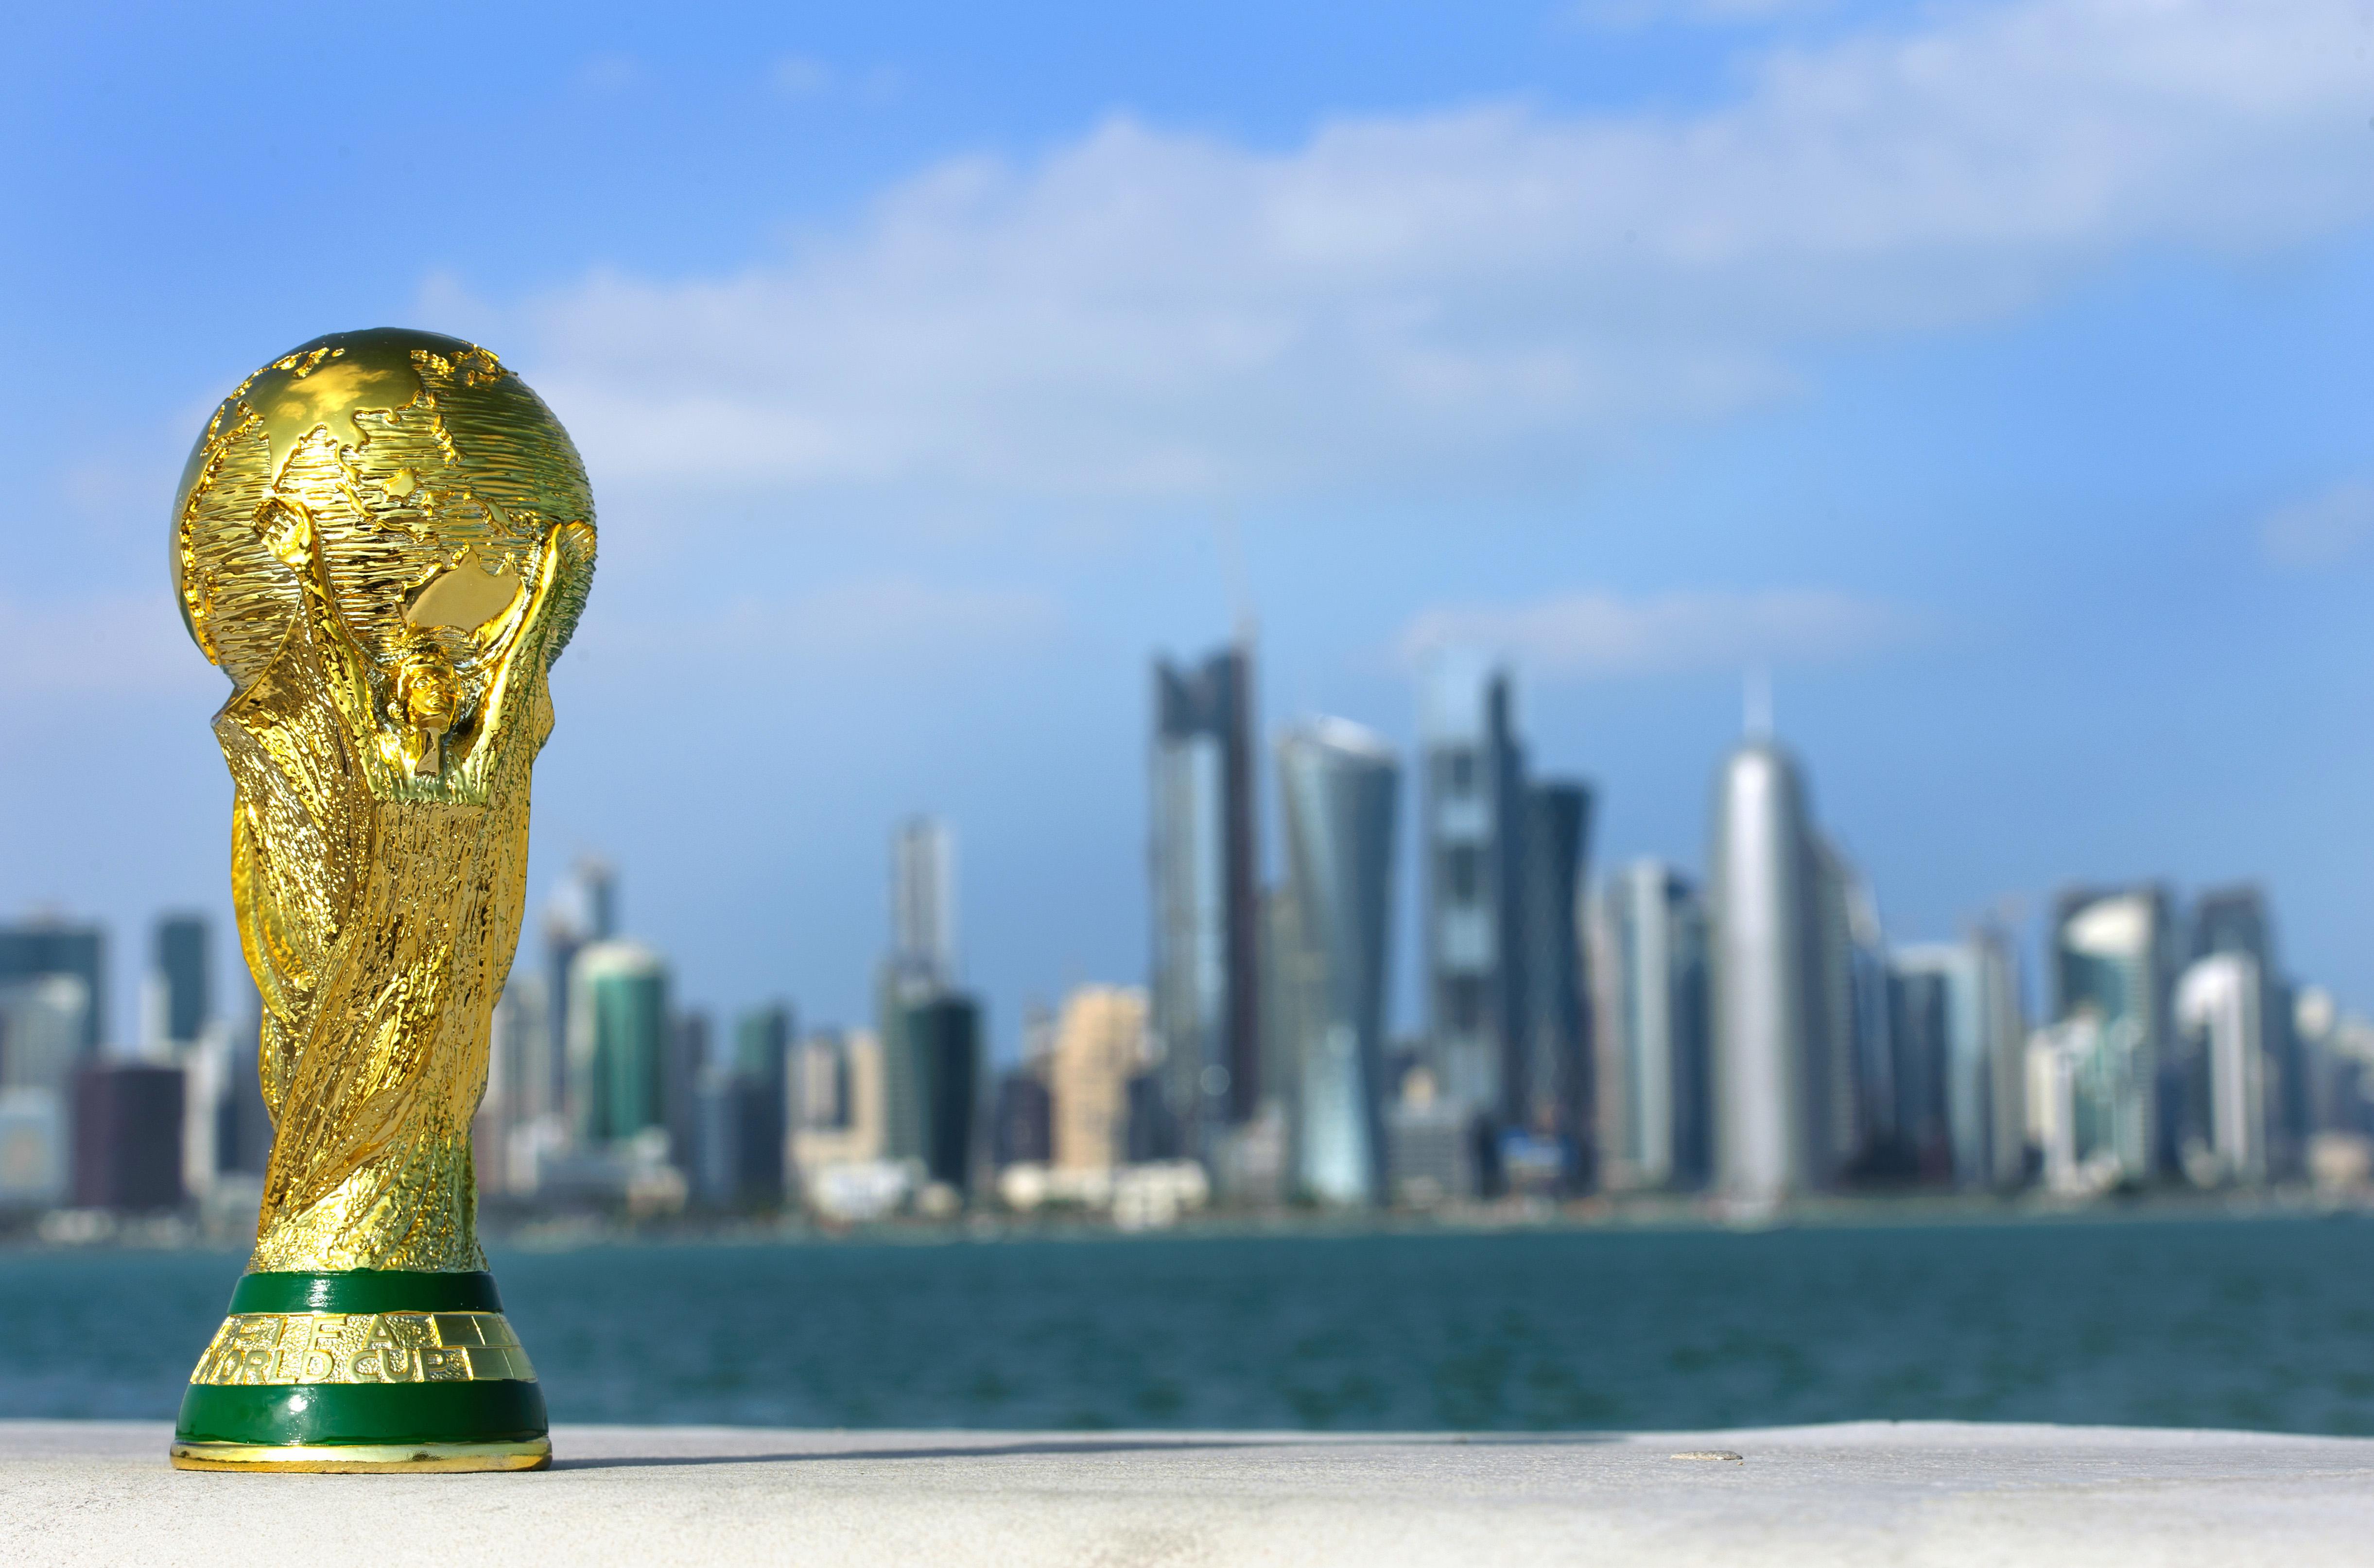 Soccer - Travel - Doha, Qatar - FIFA WORLD CUP 2022